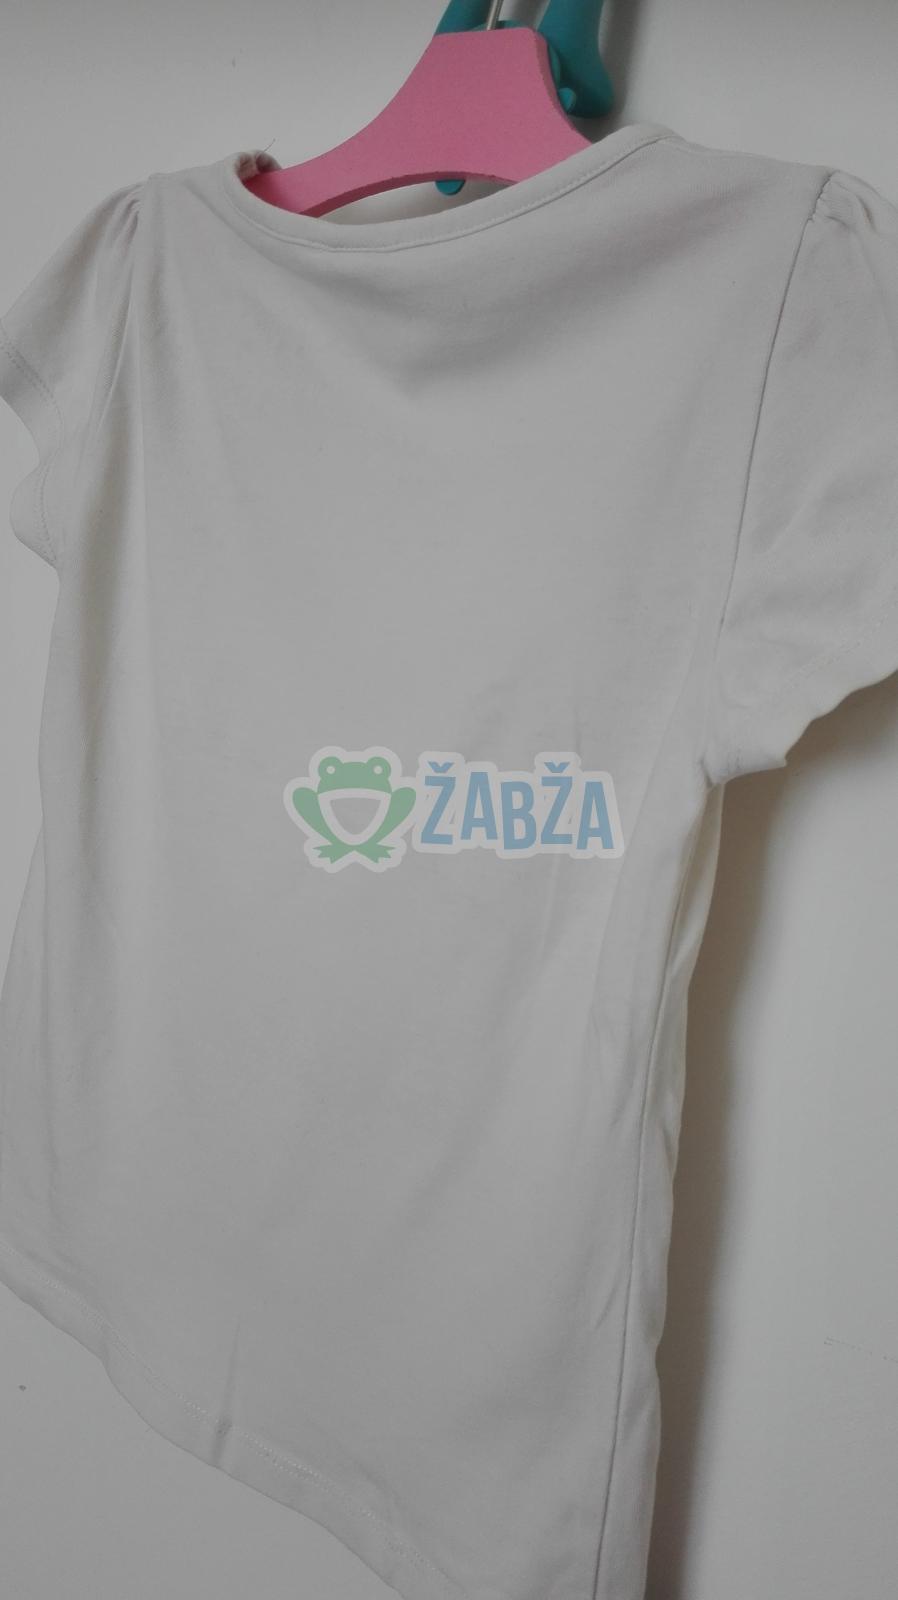 Tričko bílé